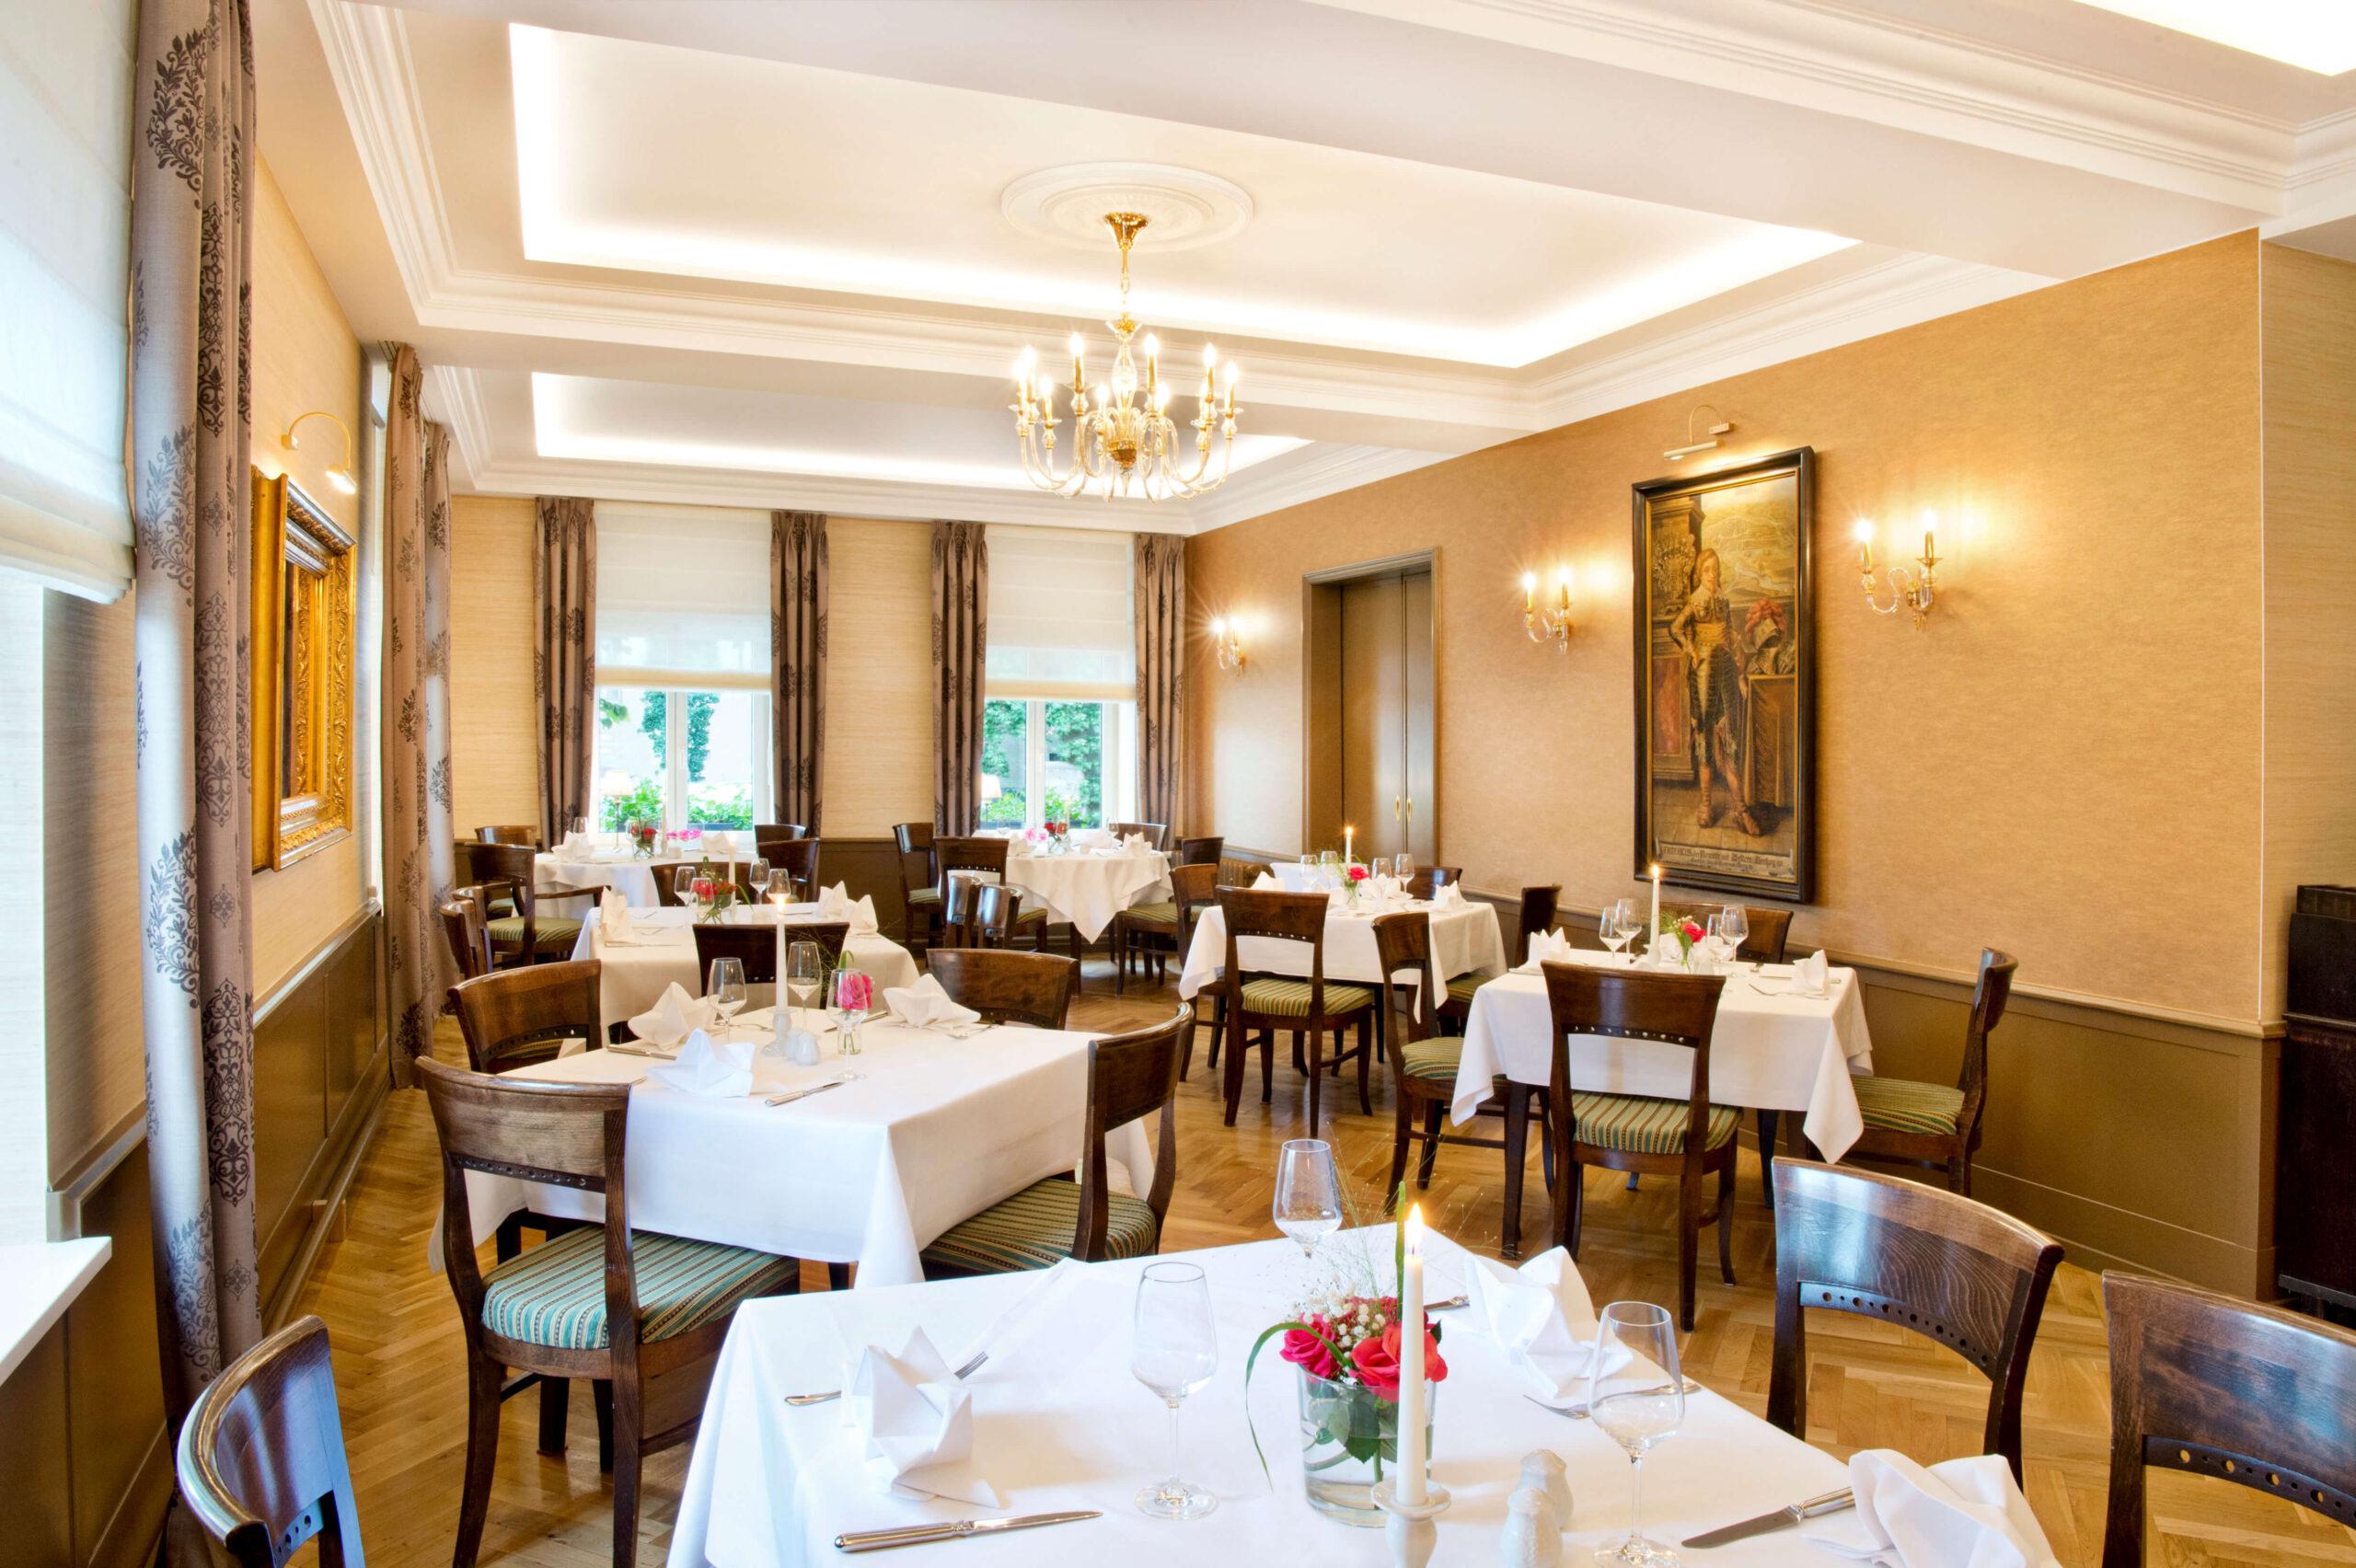 Hotel and restaurant in Jena